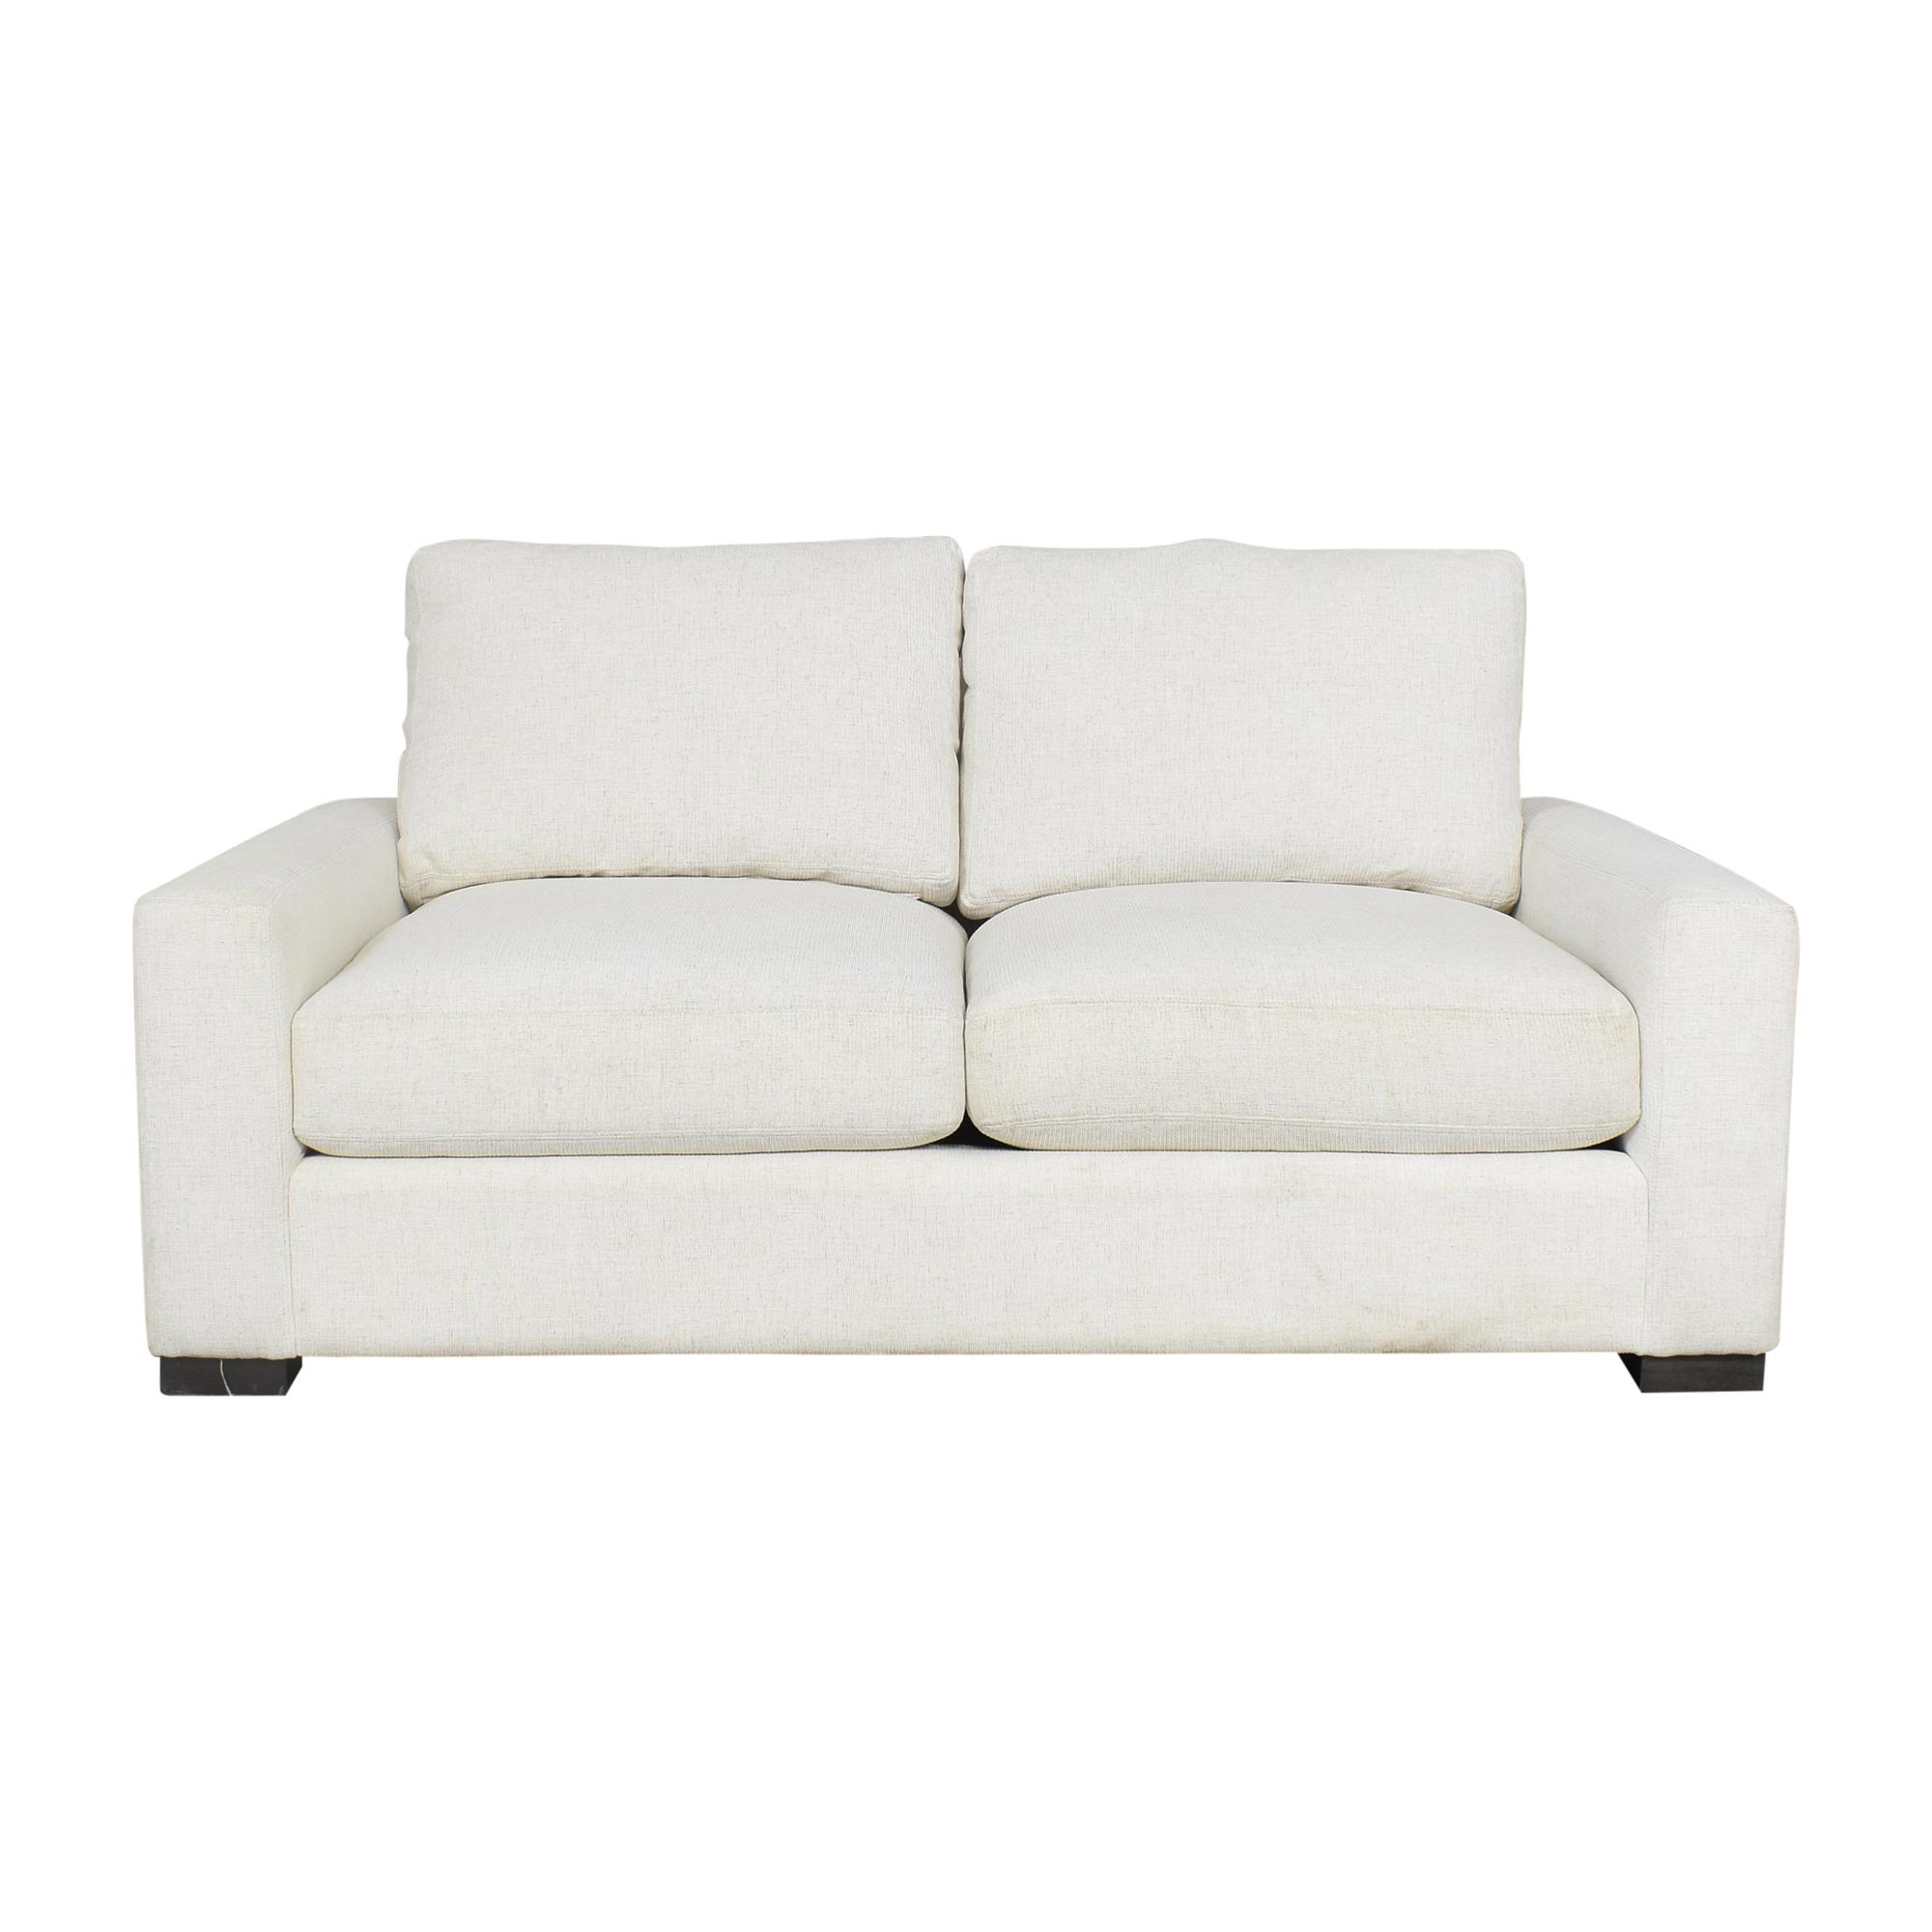 buy Arhaus Arhaus Remington Two Over Two Sofa online